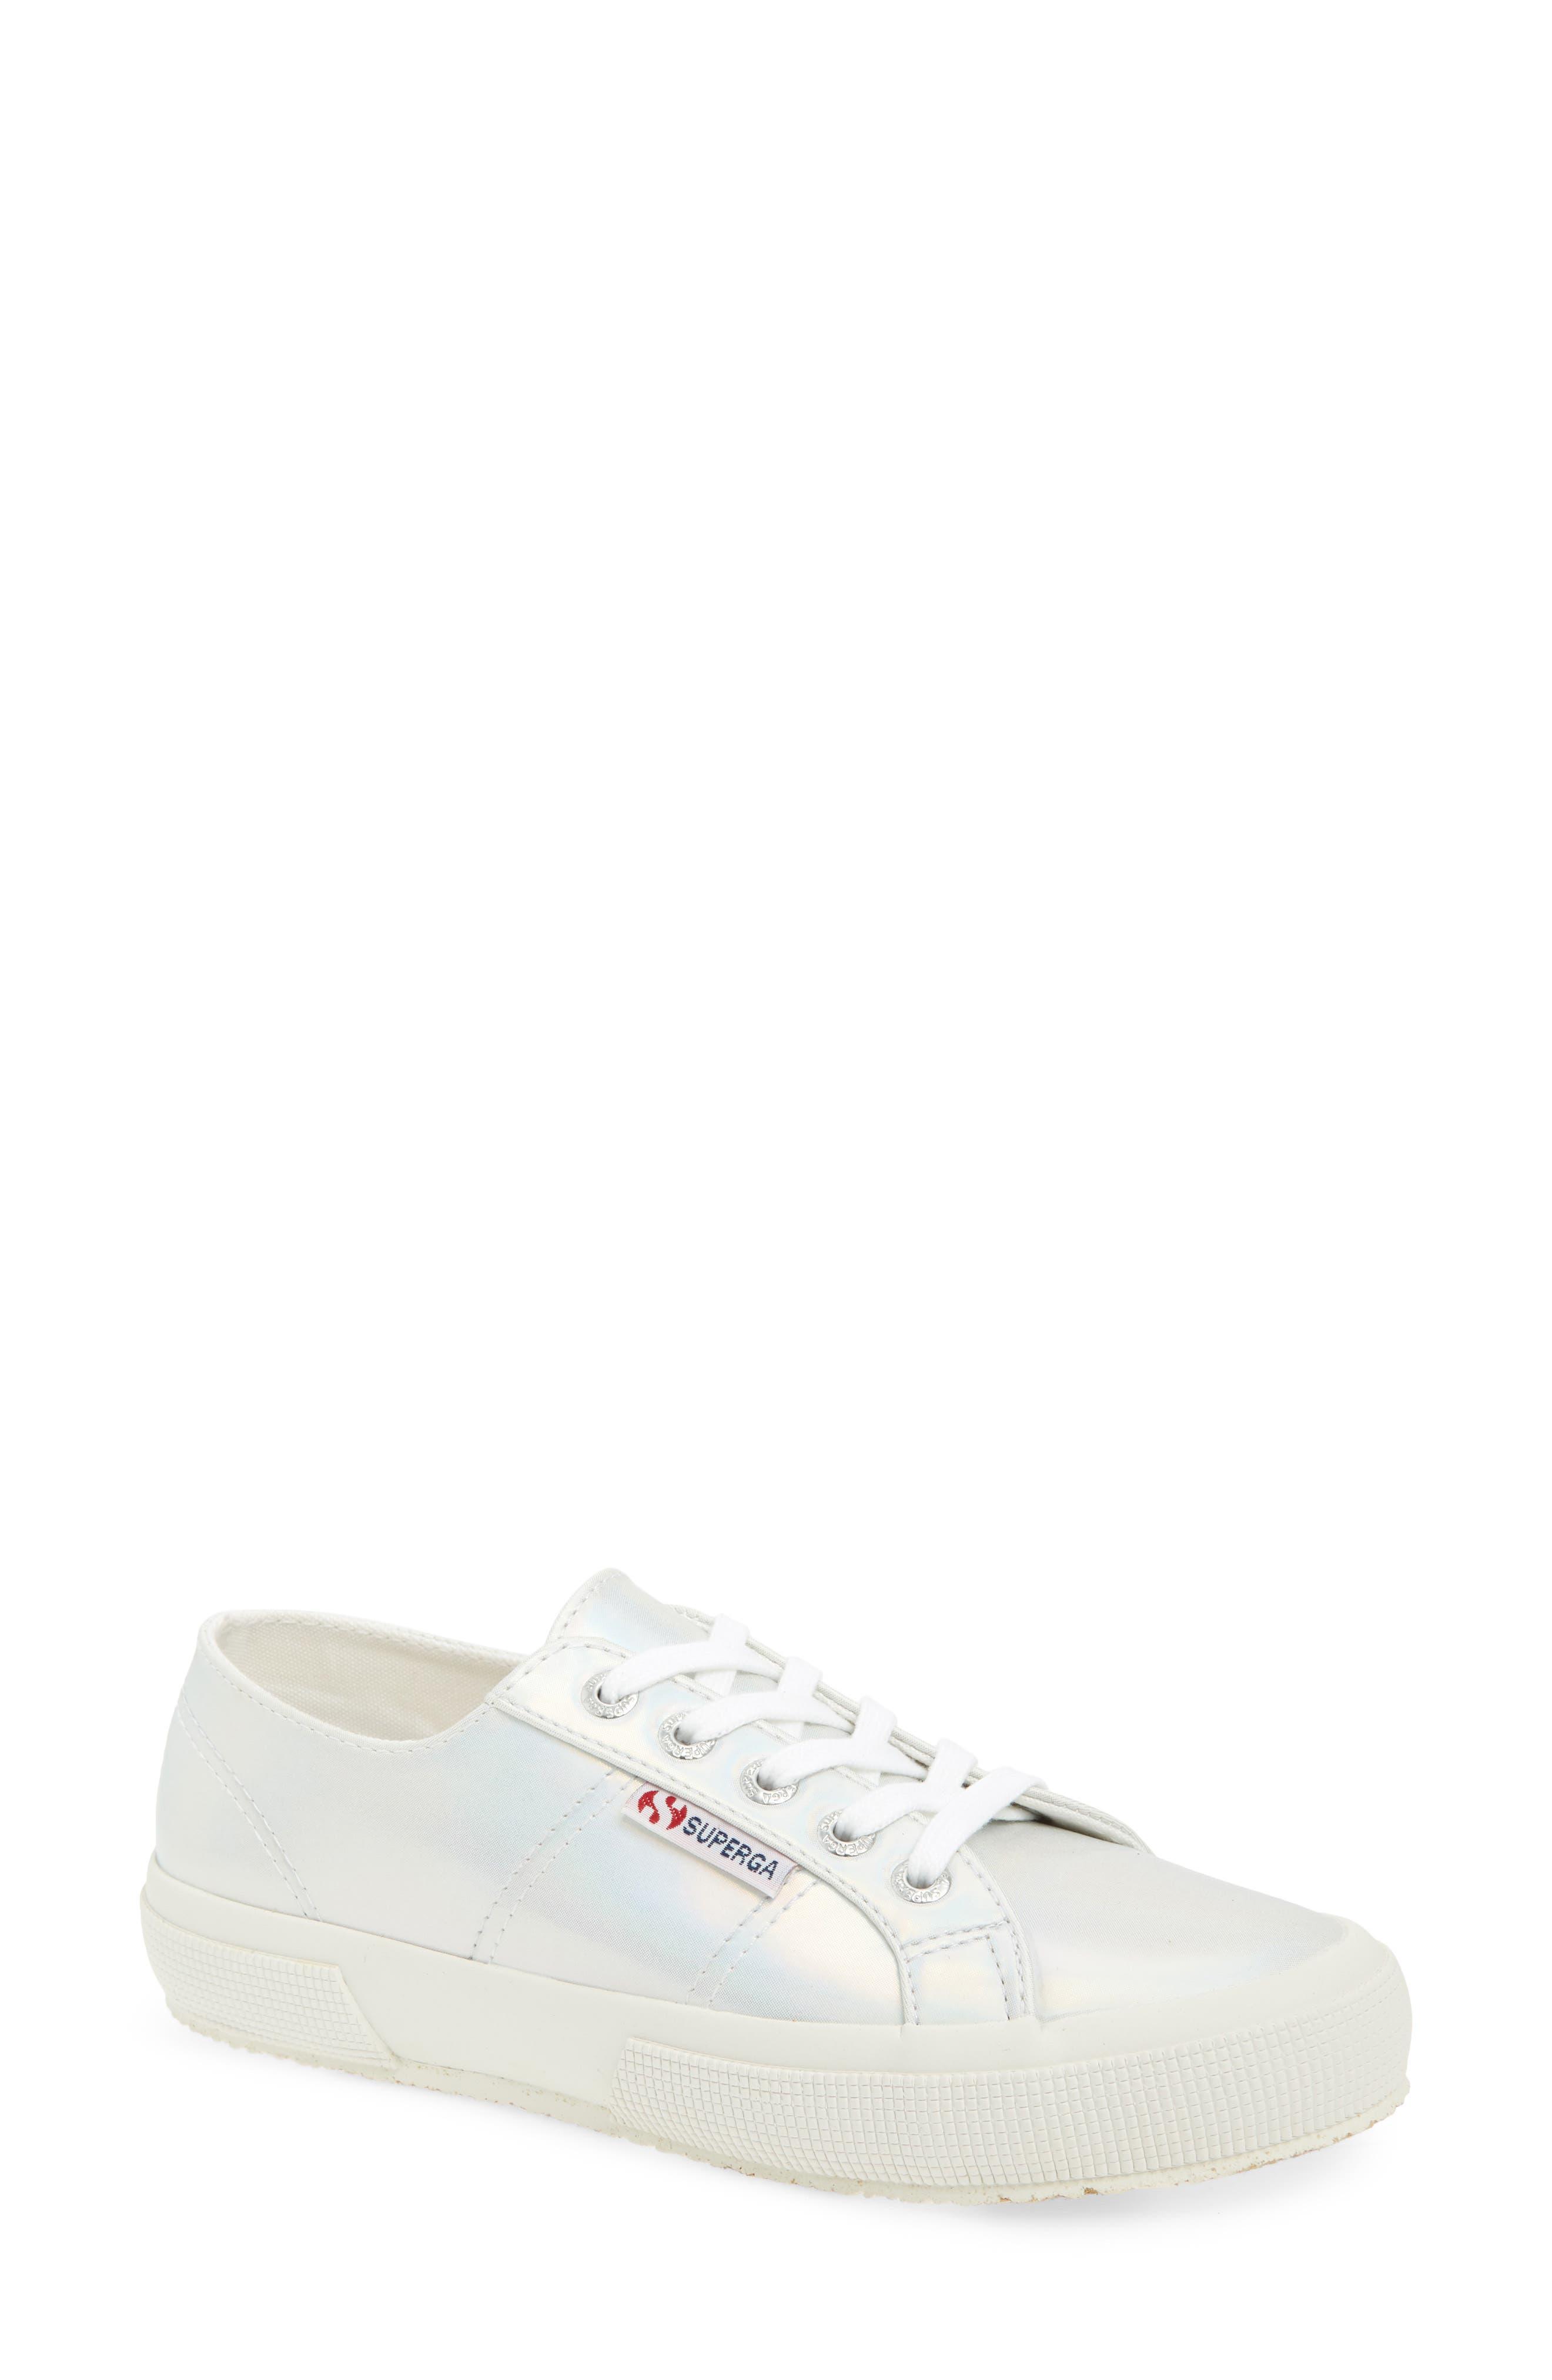 2750 Hologramw Low Top Sneaker,                         Main,                         color, Iridescent